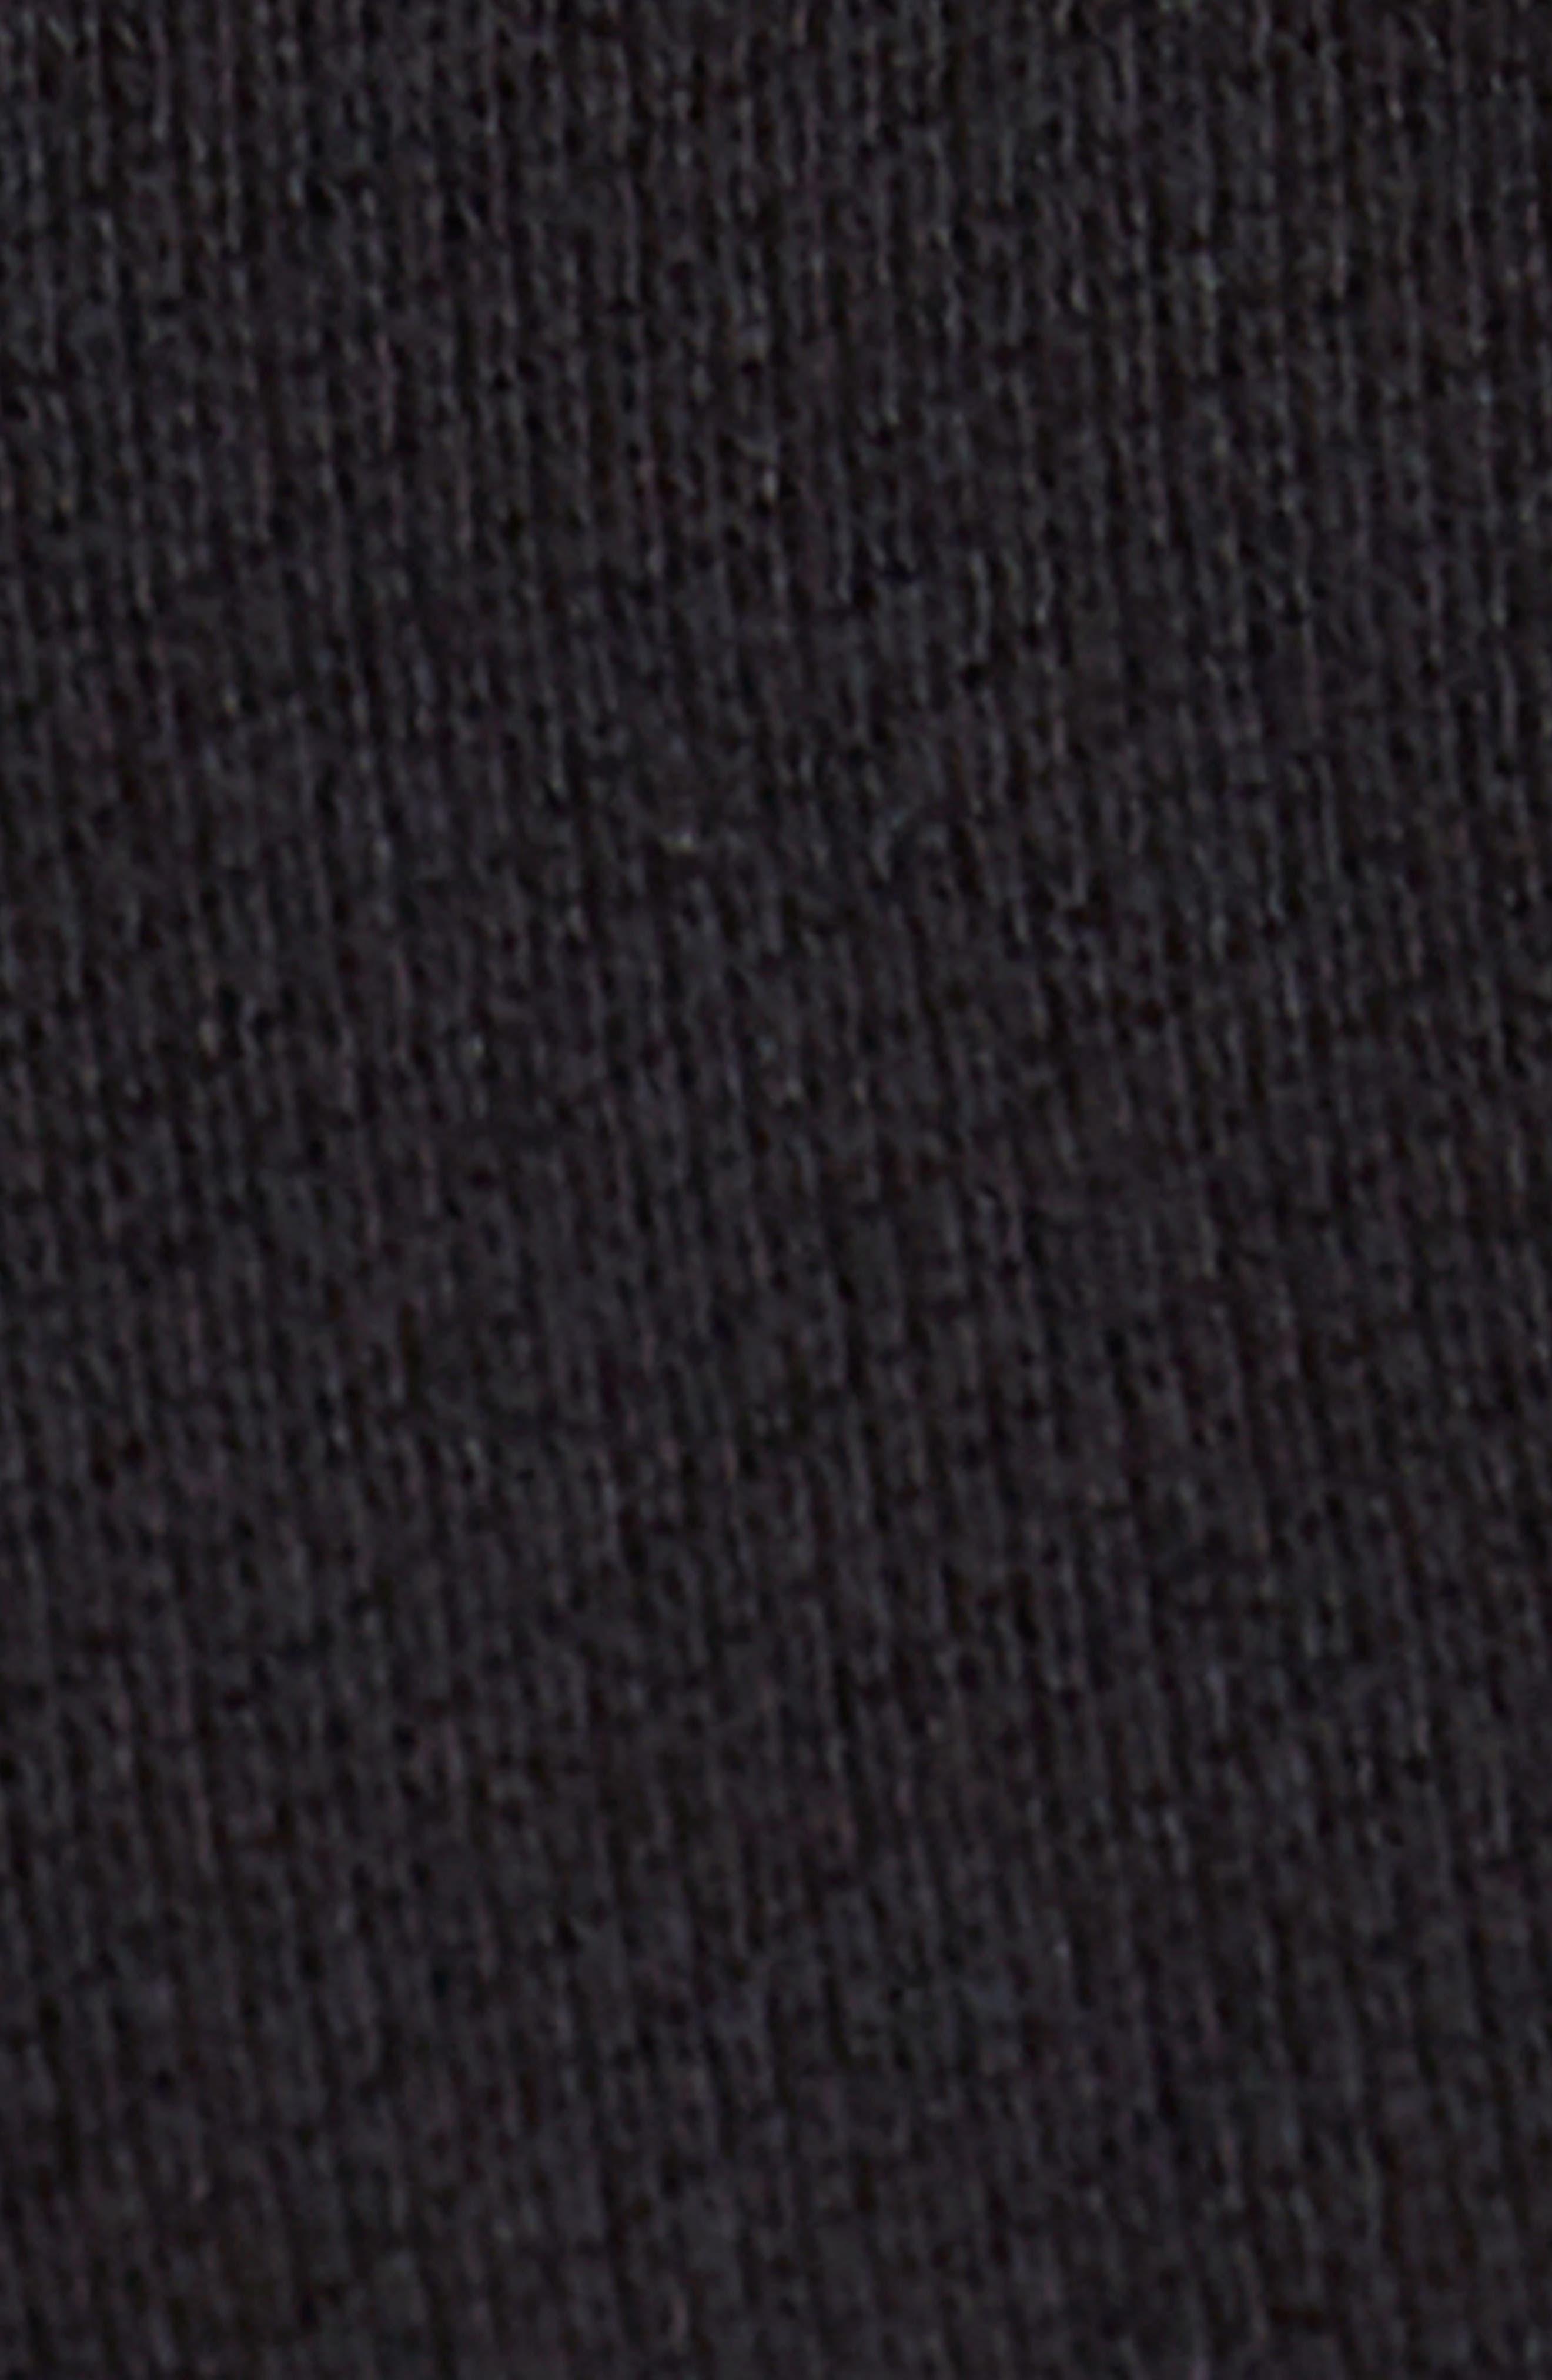 Jaxon Crop Turtleneck Sweatshirt,                             Alternate thumbnail 4, color,                             001